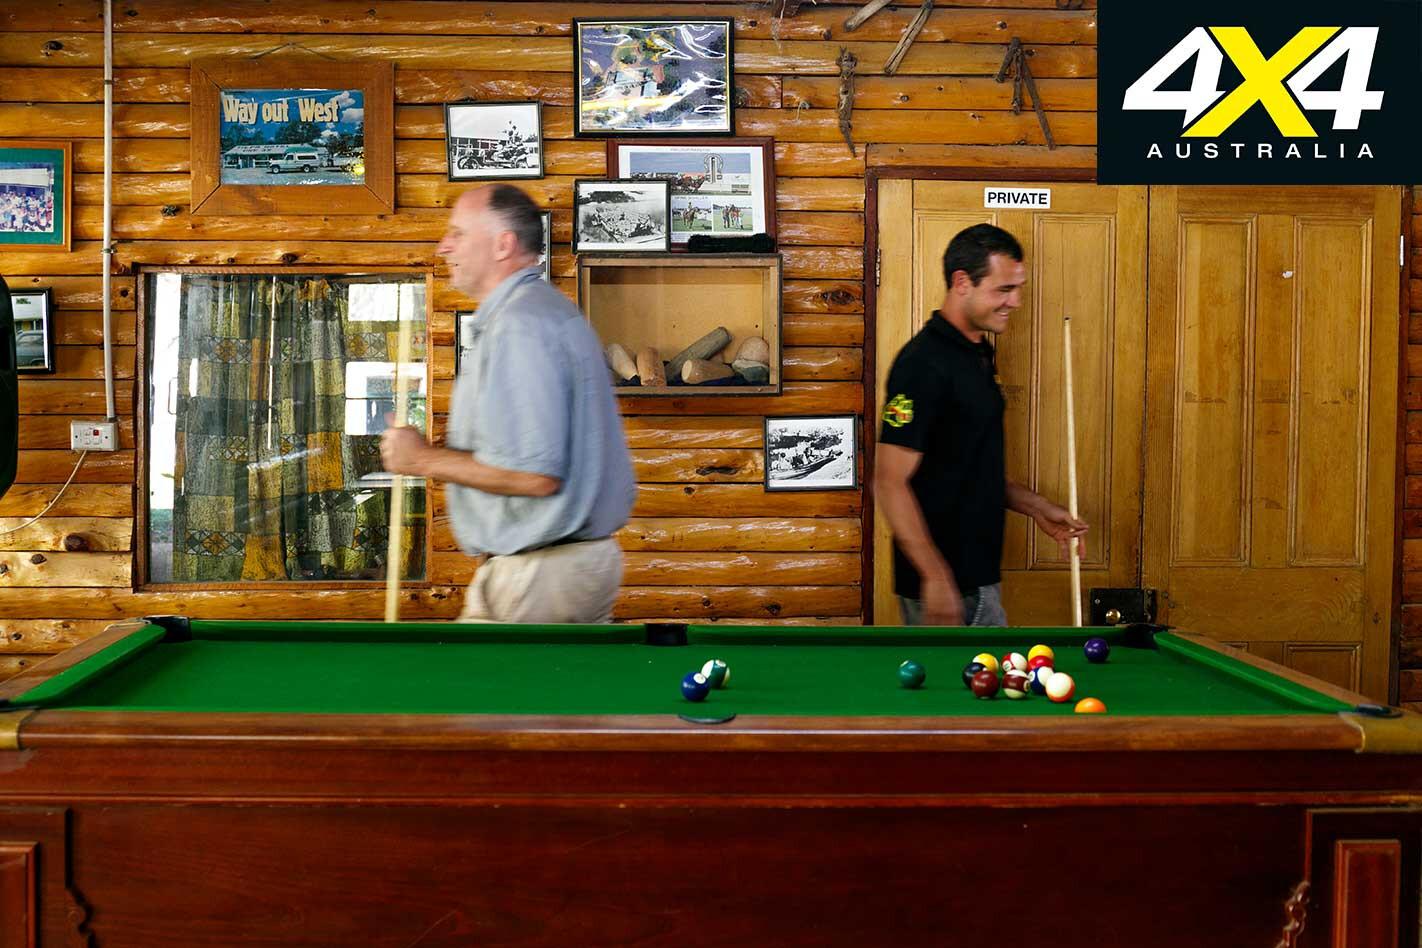 4 X 4 Pubs Tilpa Hotel NSW Pool Table Jpg